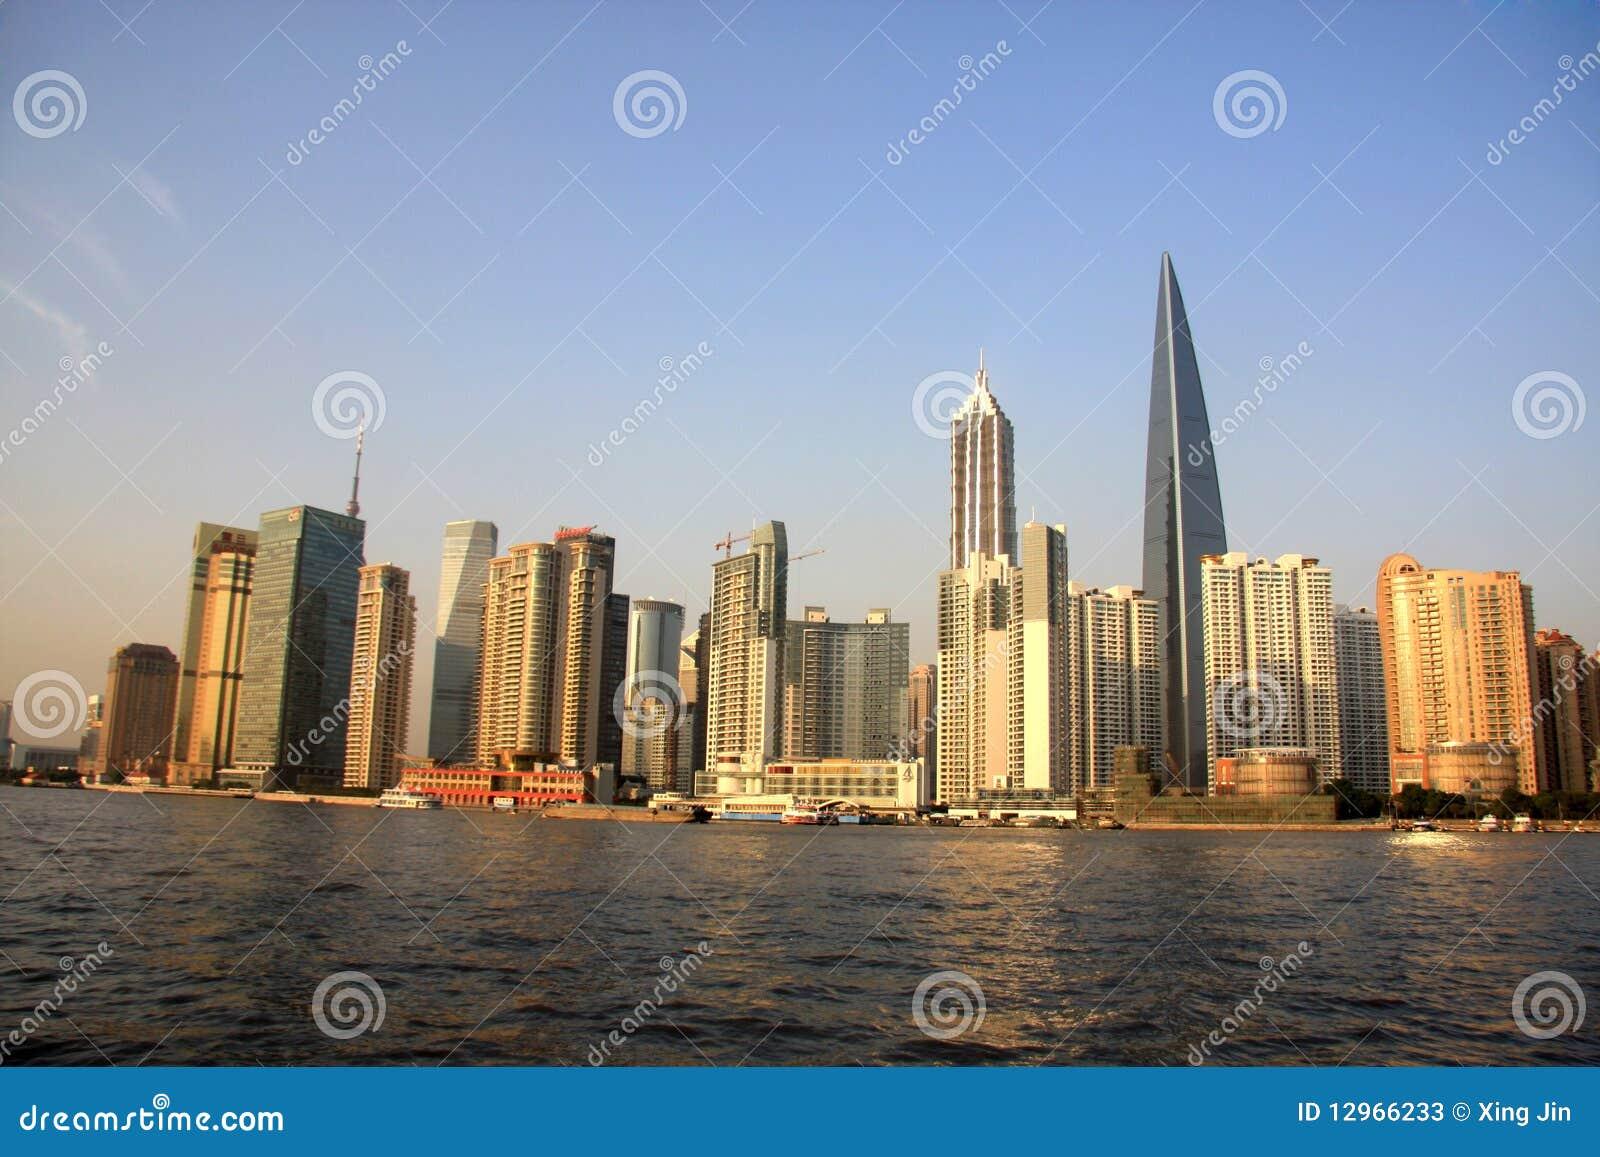 Lujiazui pudong上海